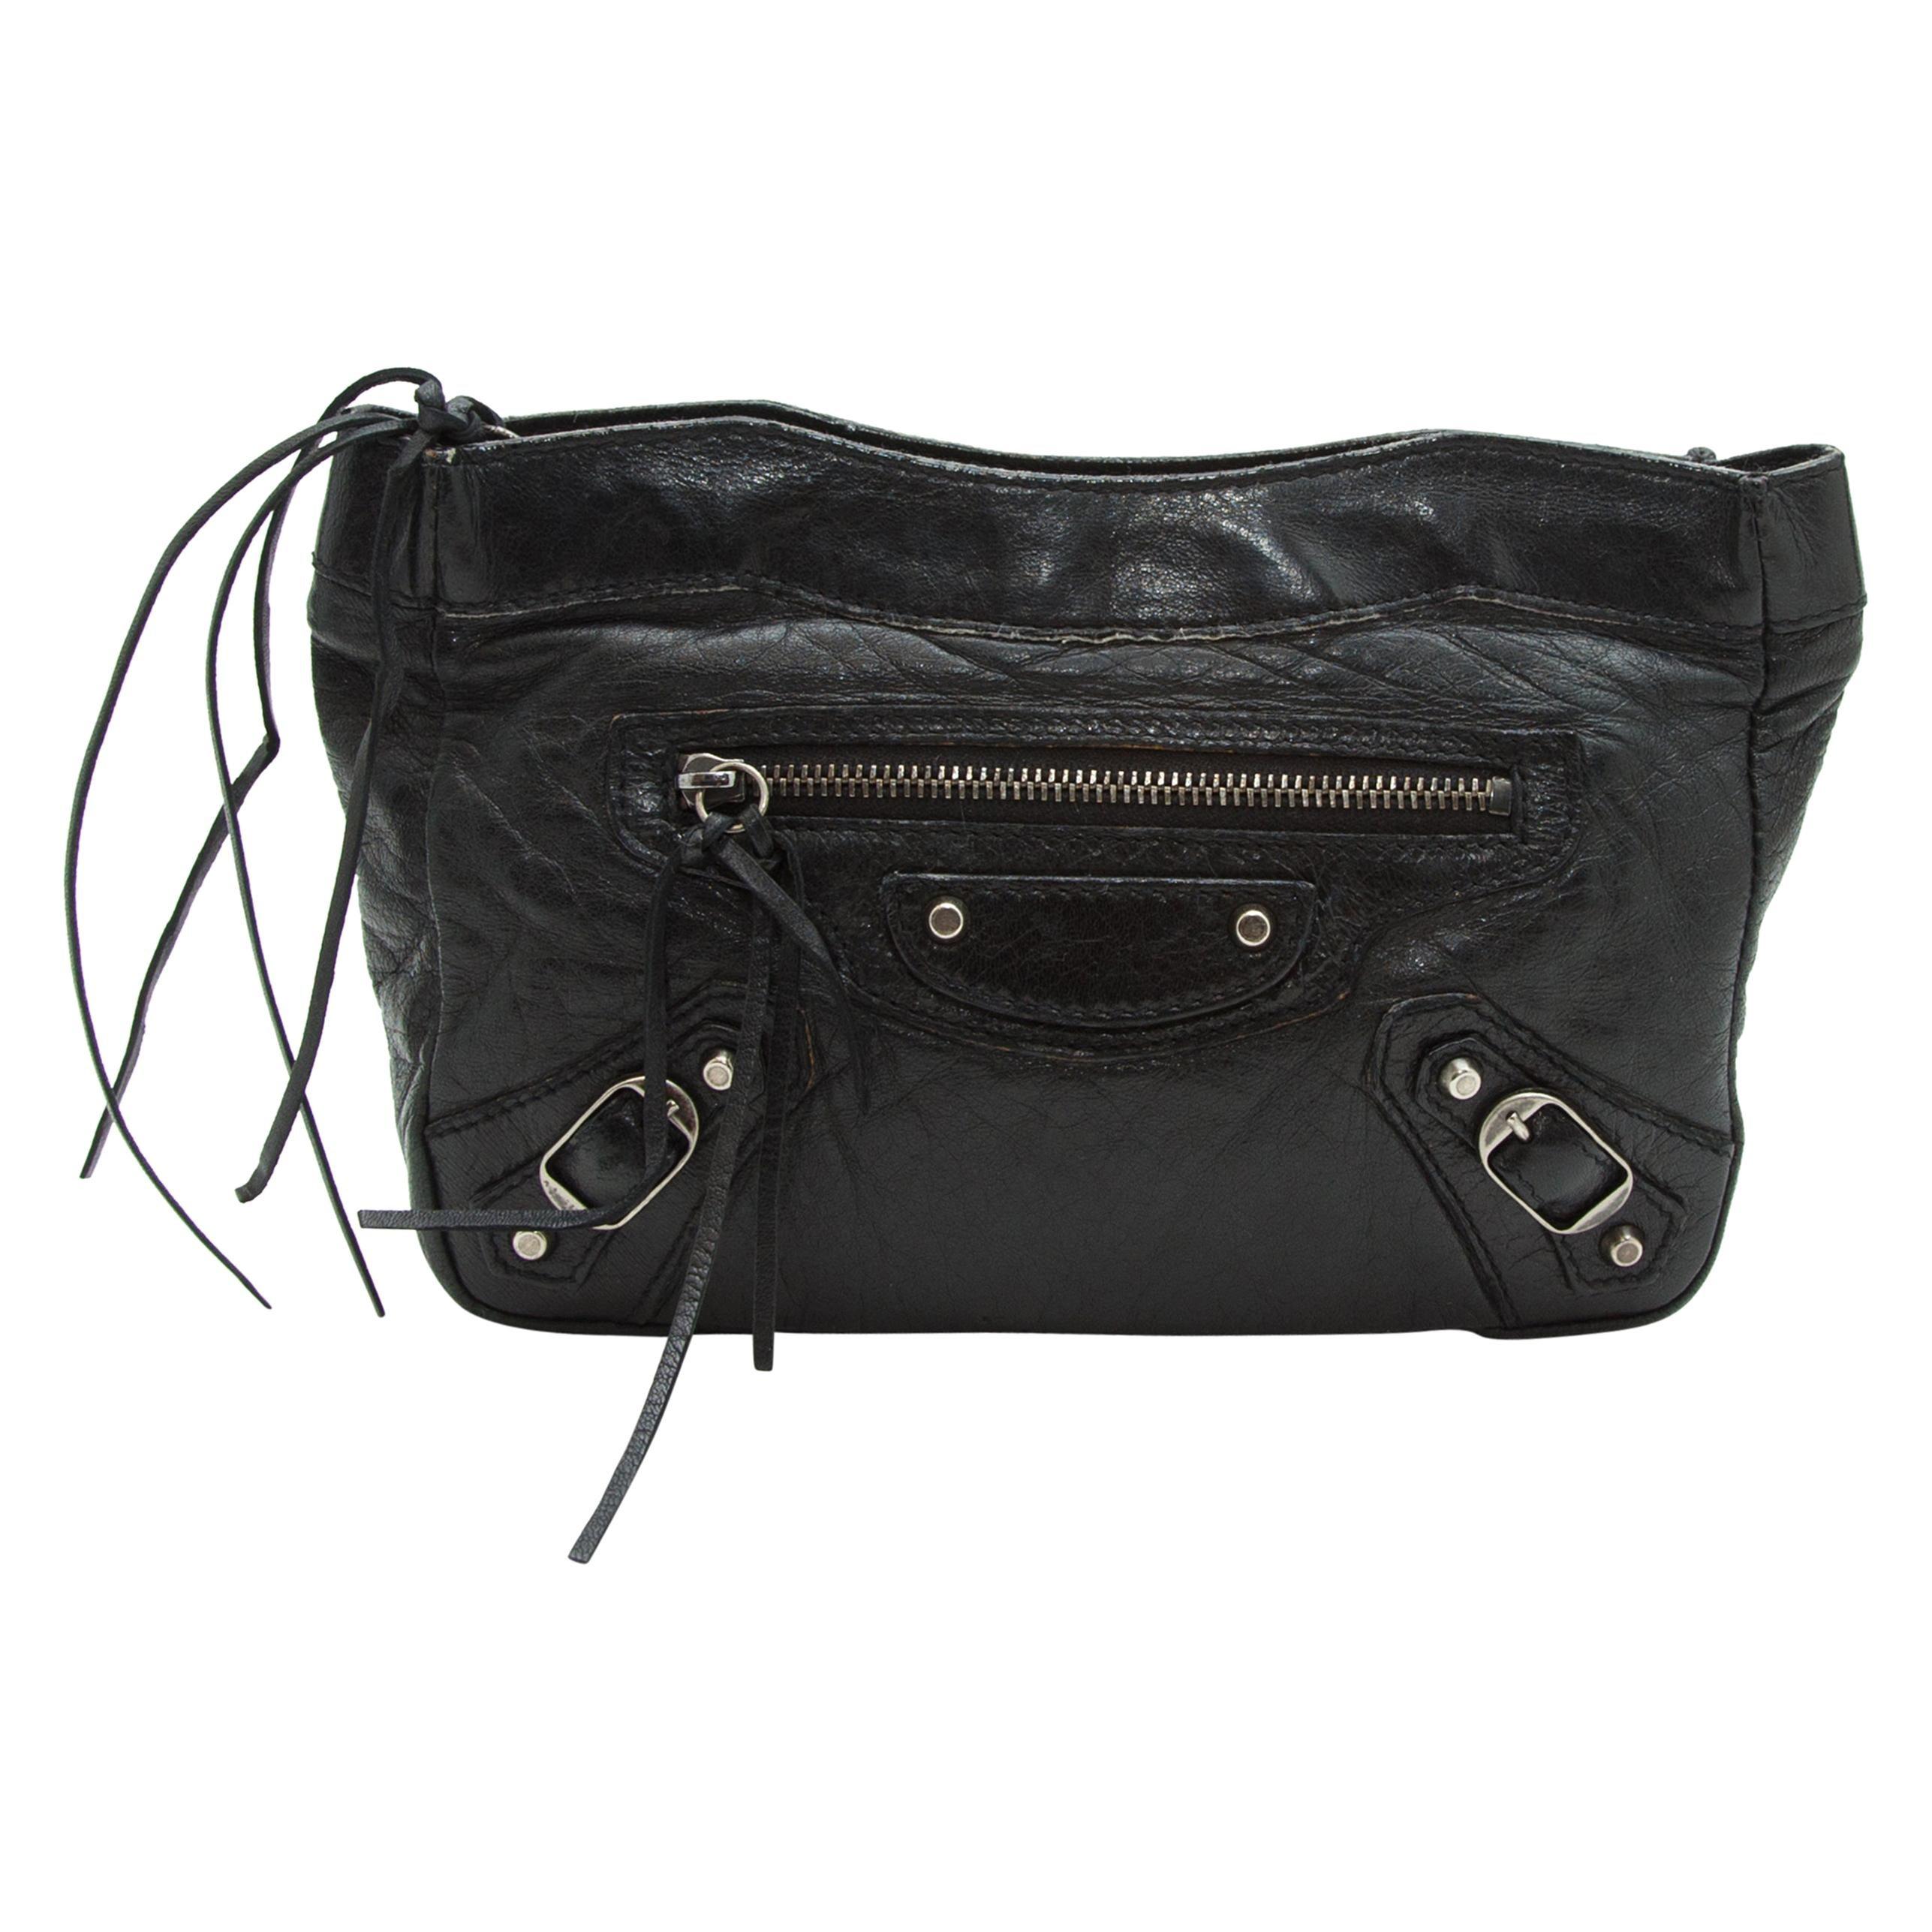 Balenciaga Black Leather Cosmetic Pouch